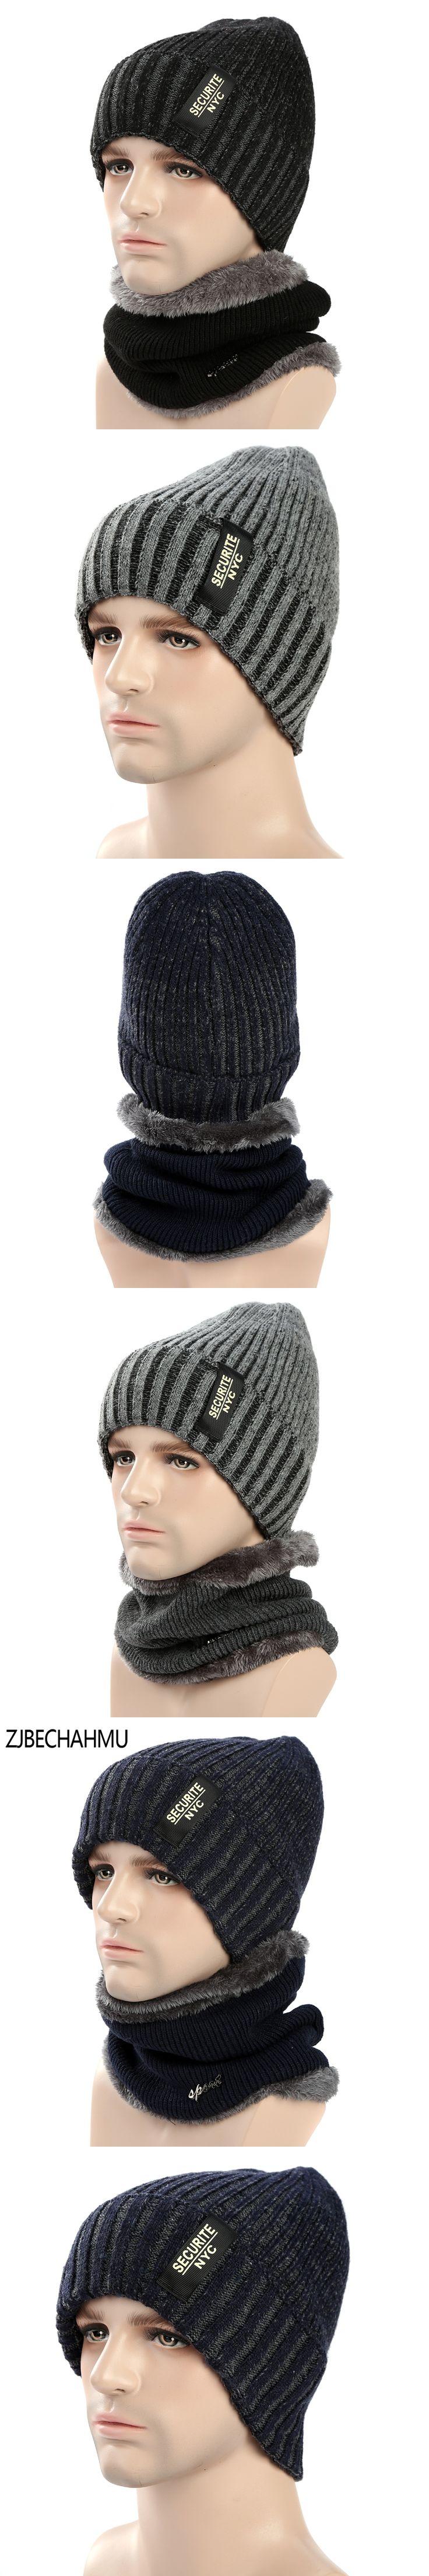 Fashoin Winter Beanies Mens Scarf Knitted Hat Caps Mask Gorras Bonnet Warm Baggy Winter Hats For Men Women Skullies Beanies Hats